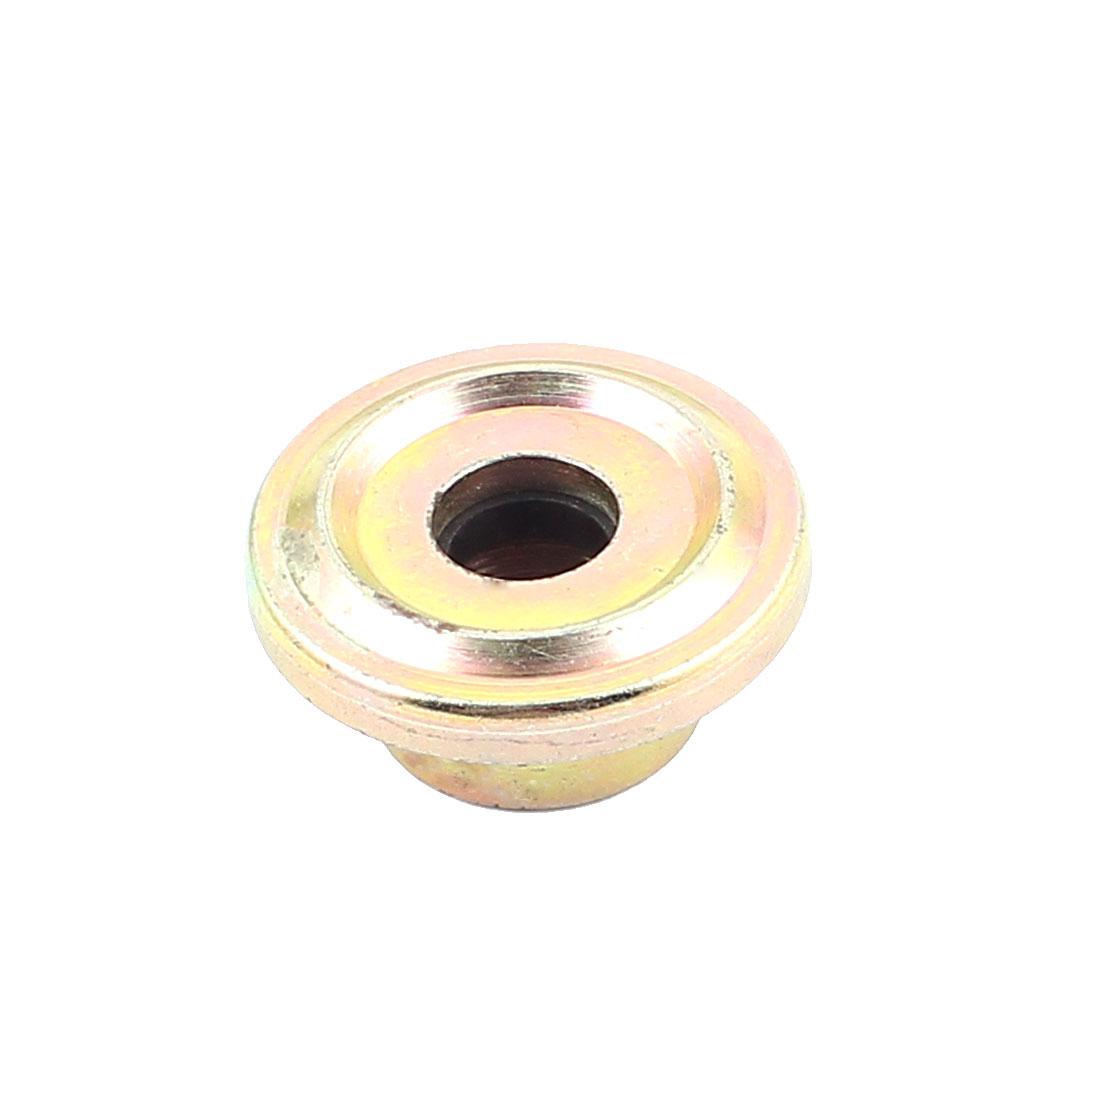 40mm Dia 1/2BSP Thread Metal Trend Guide Bush Bronze Tone